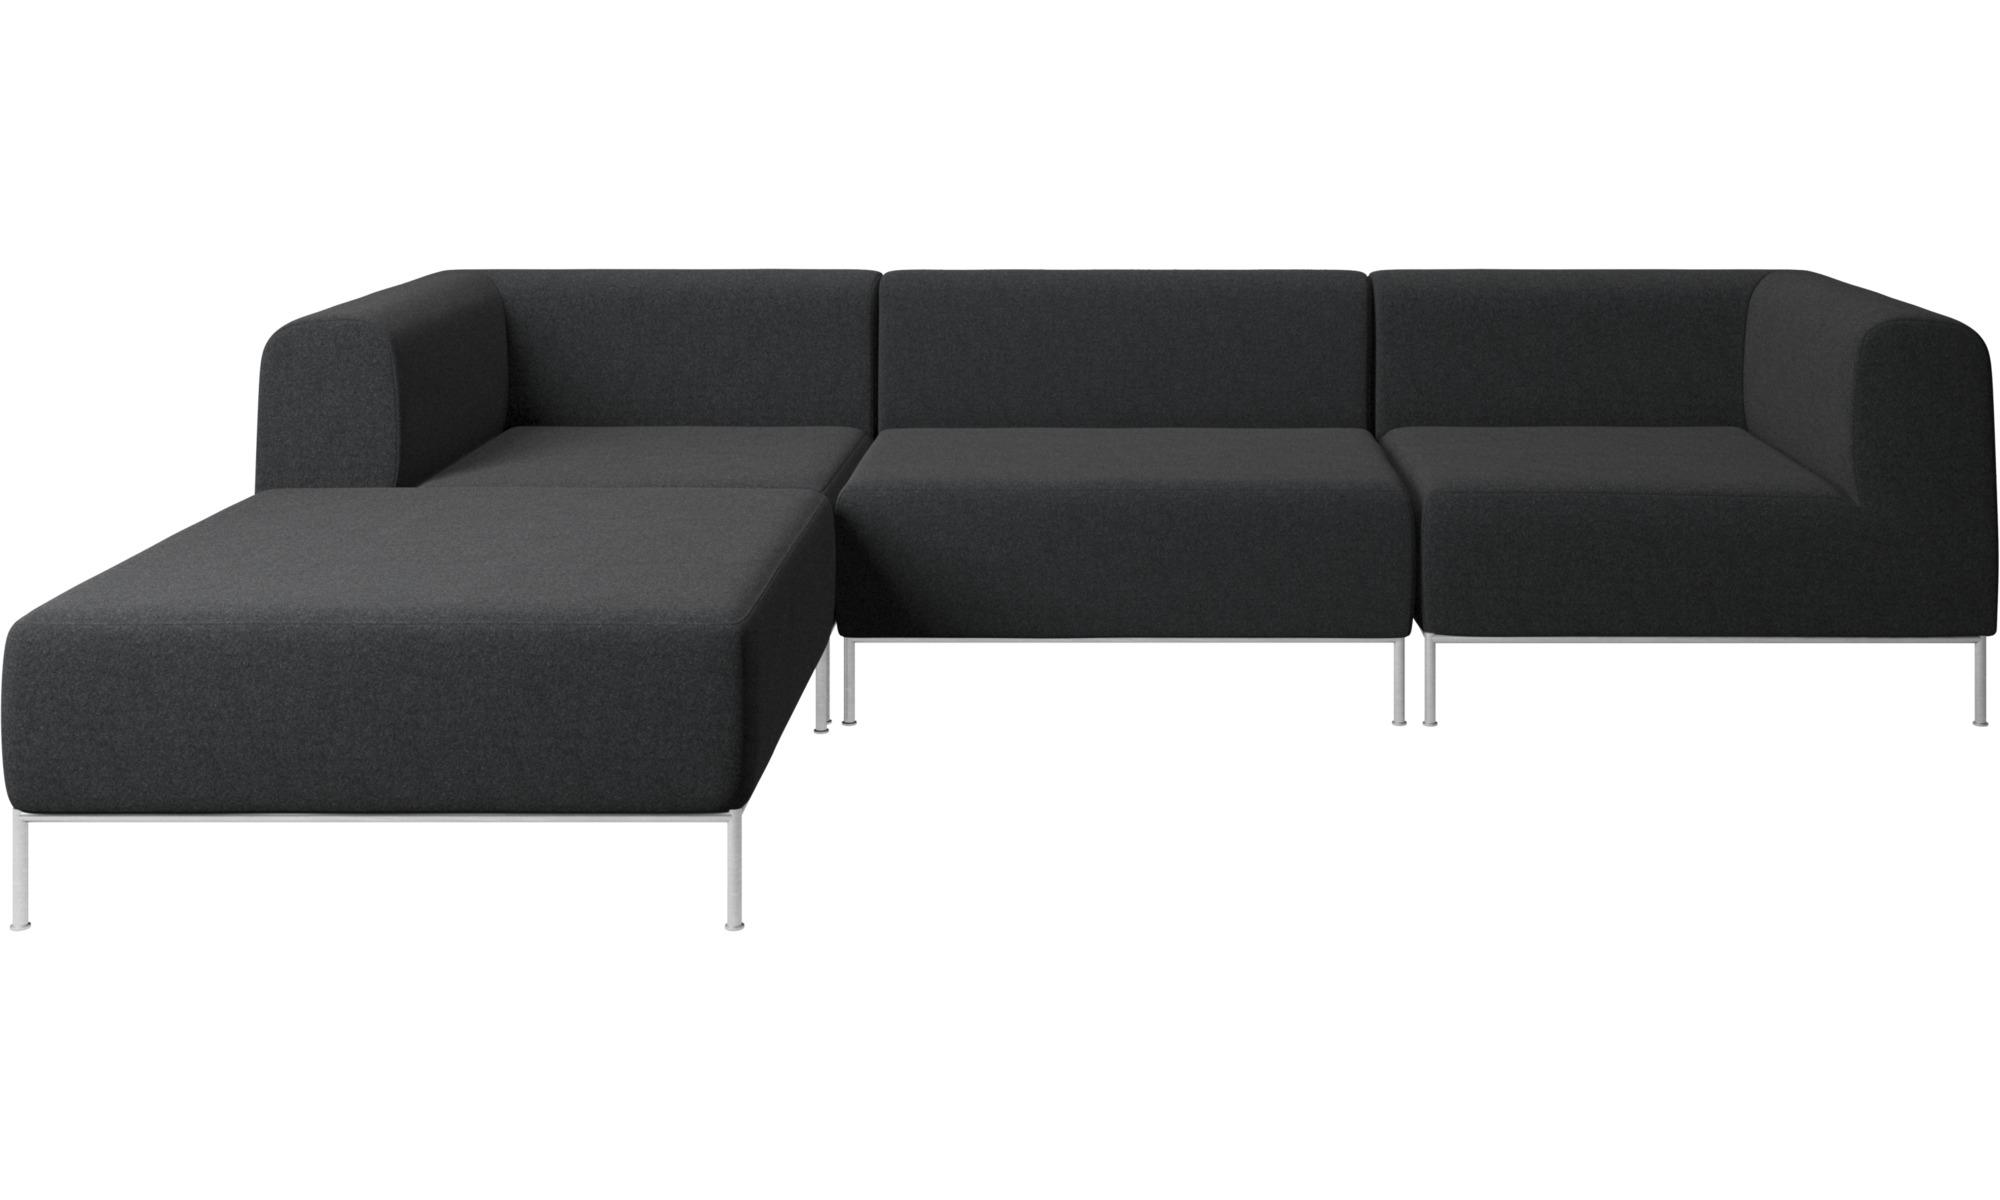 Modular sofas - Miami sofa with footstool on left side - Metal